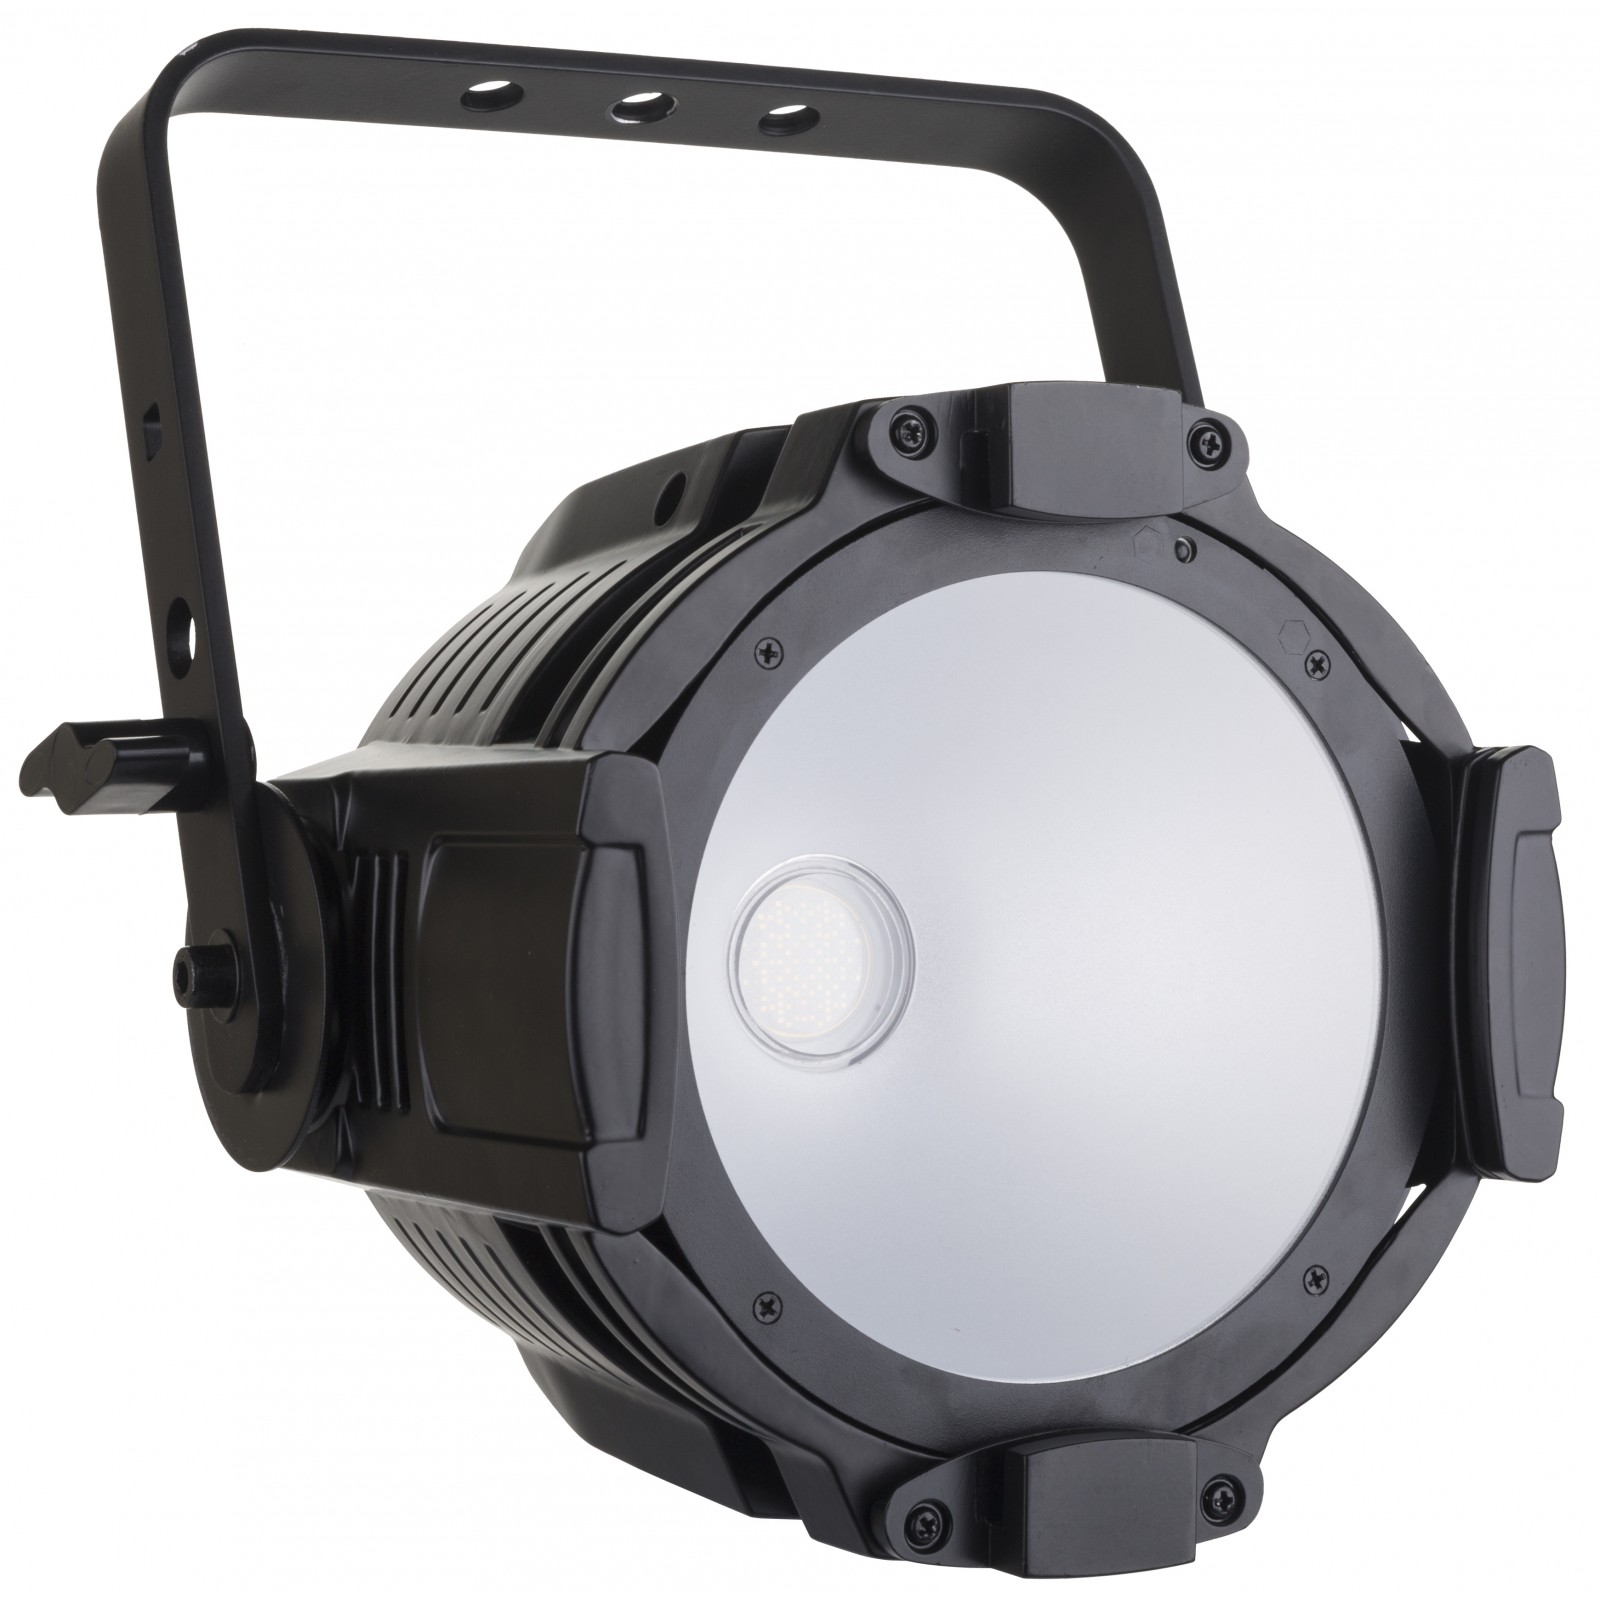 briteq led uv gun 100w projecteur canon lumi re noire. Black Bedroom Furniture Sets. Home Design Ideas